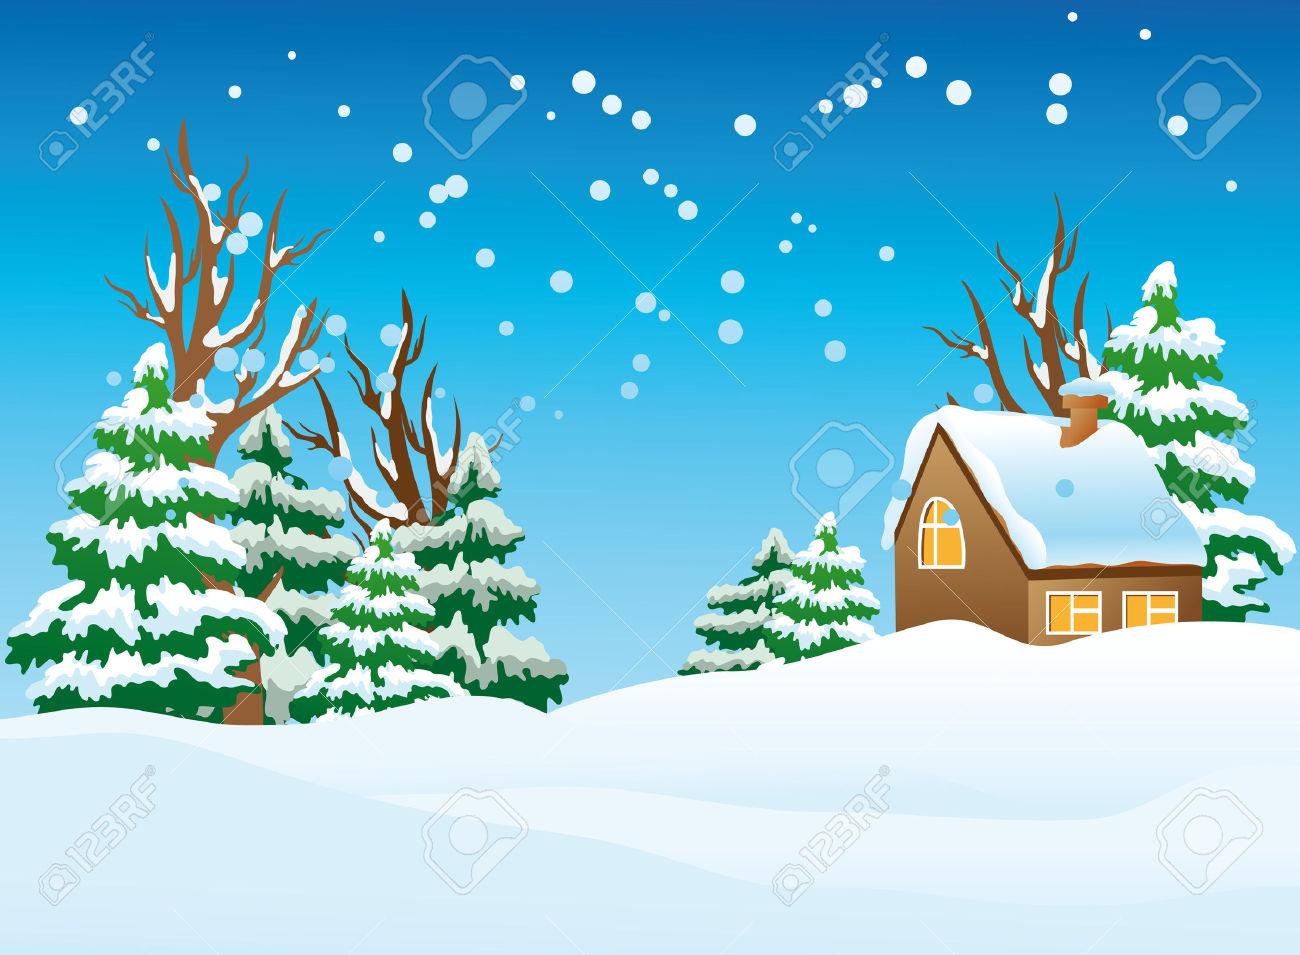 hight resolution of 60 winter landscape clip art